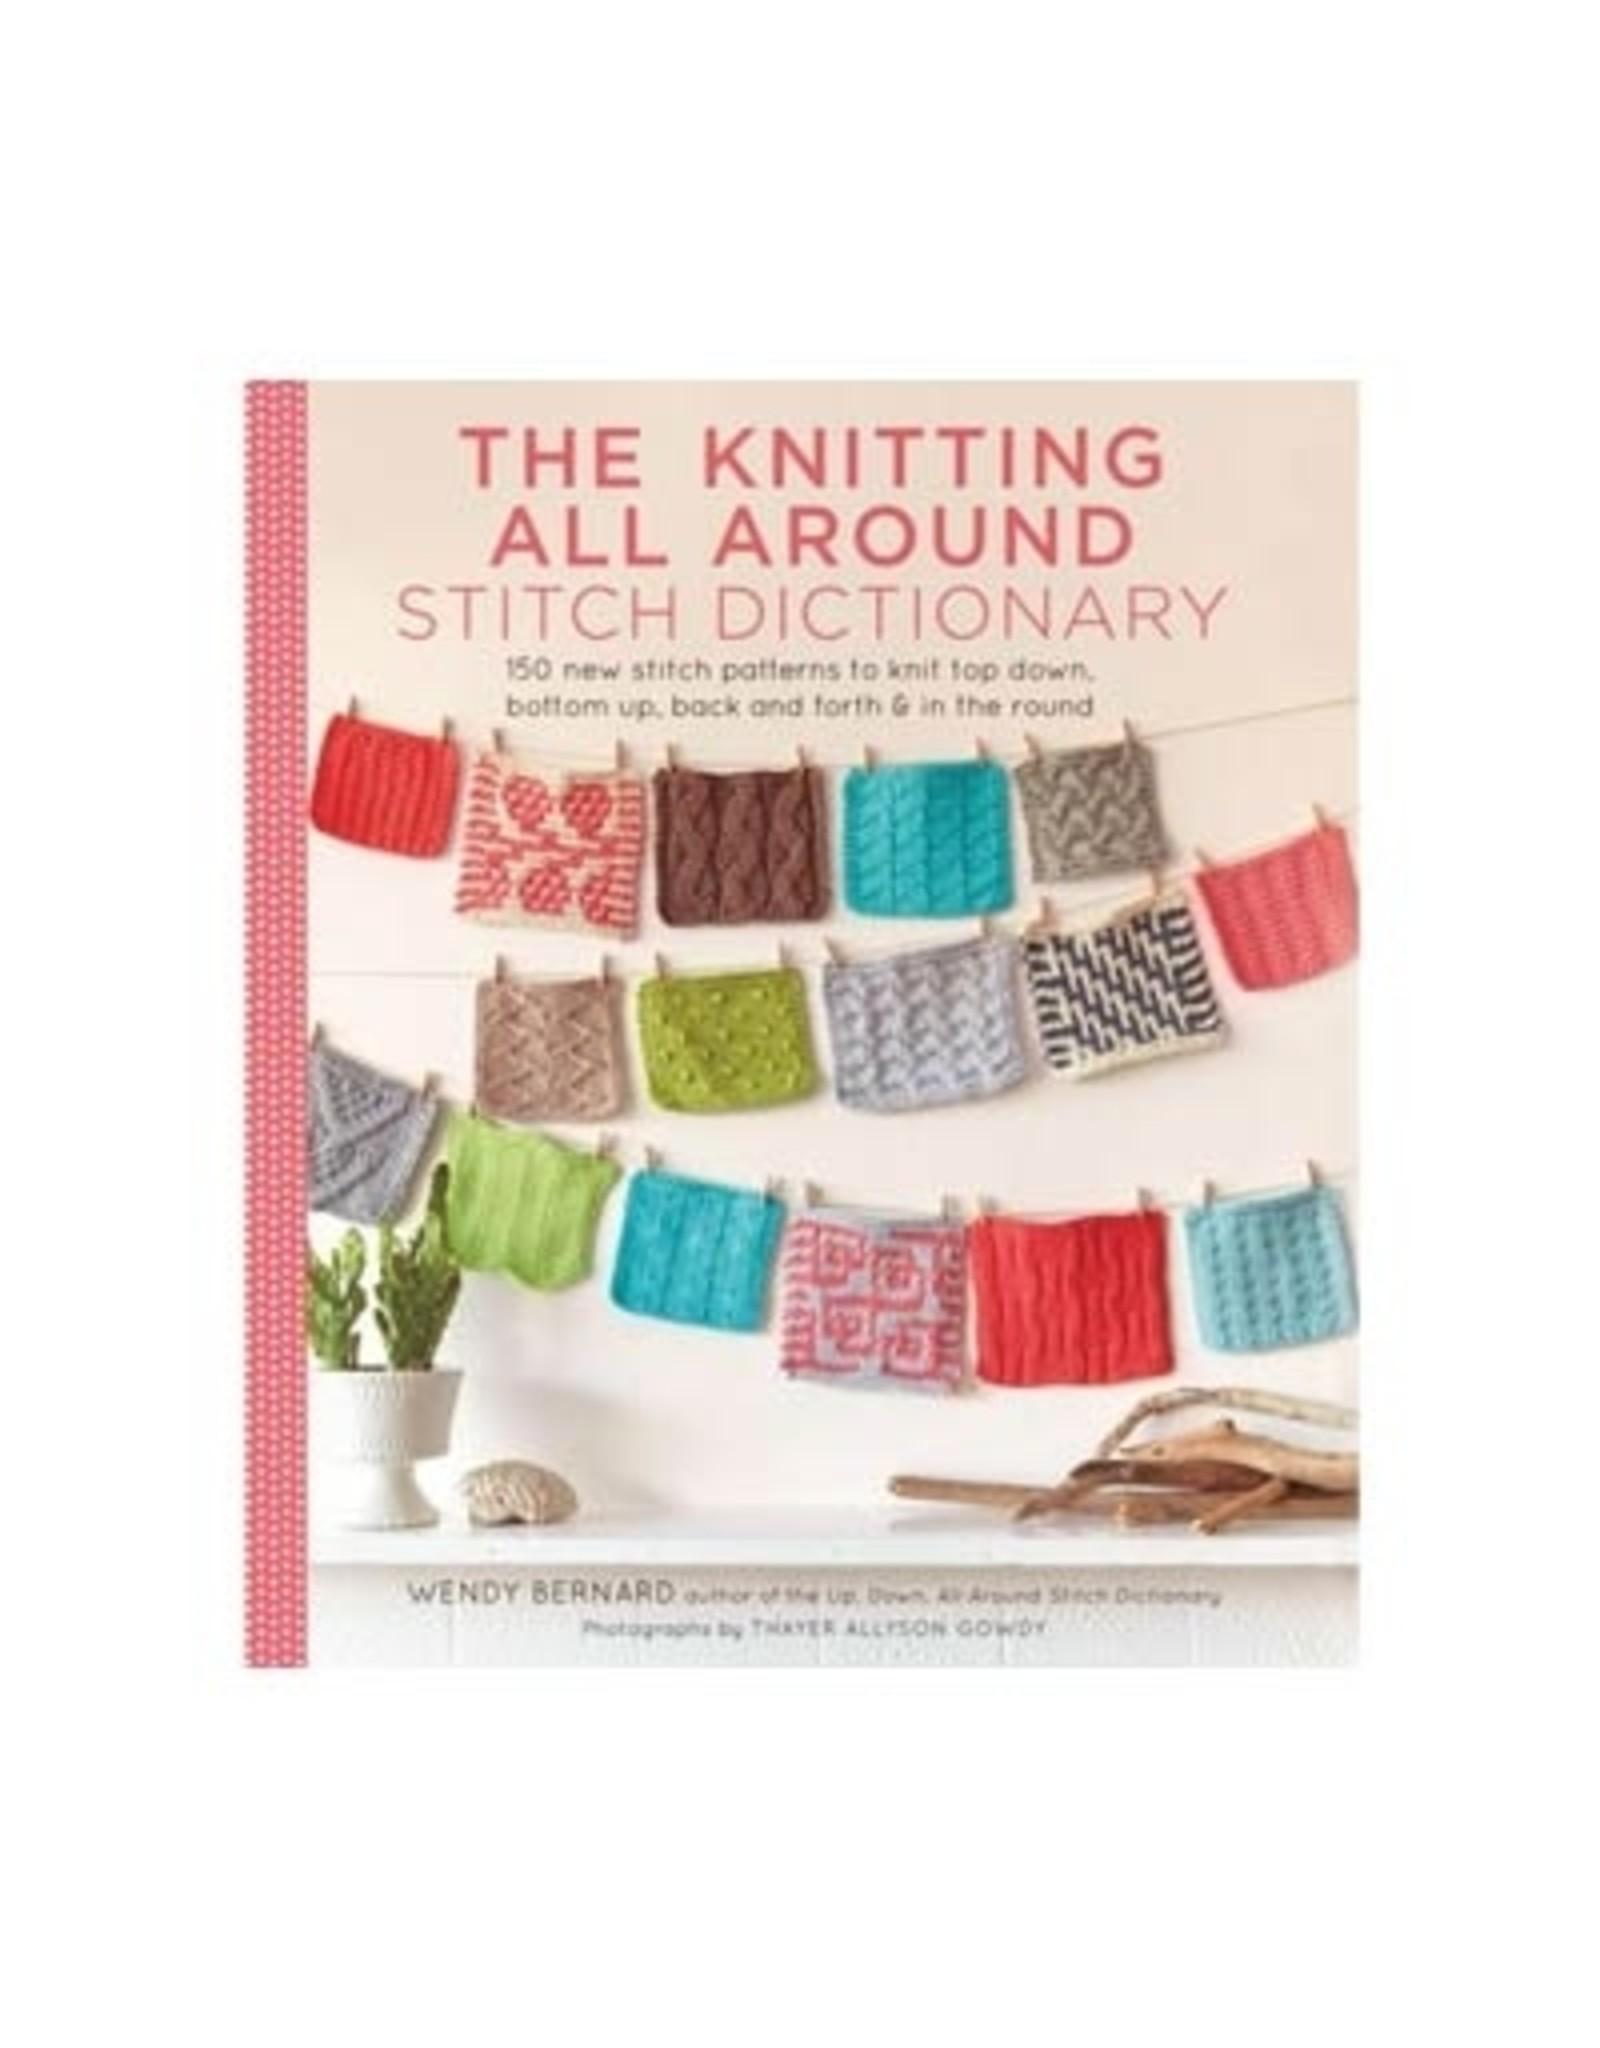 Knitting All Around Stitch Dictionary - Wendy Bernard